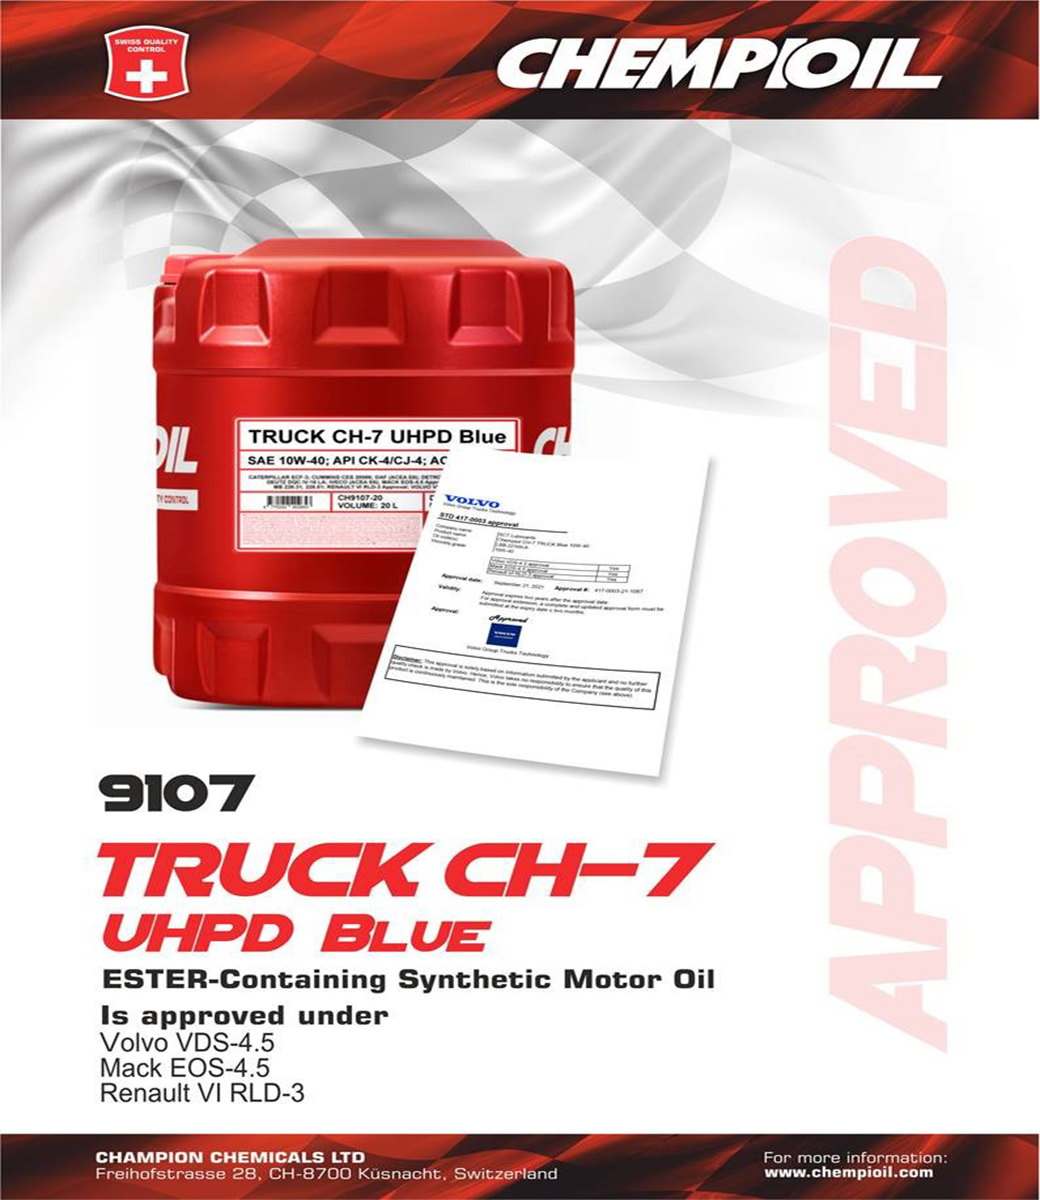 TRUCK CH-7 UHPD BLUE 10W-40